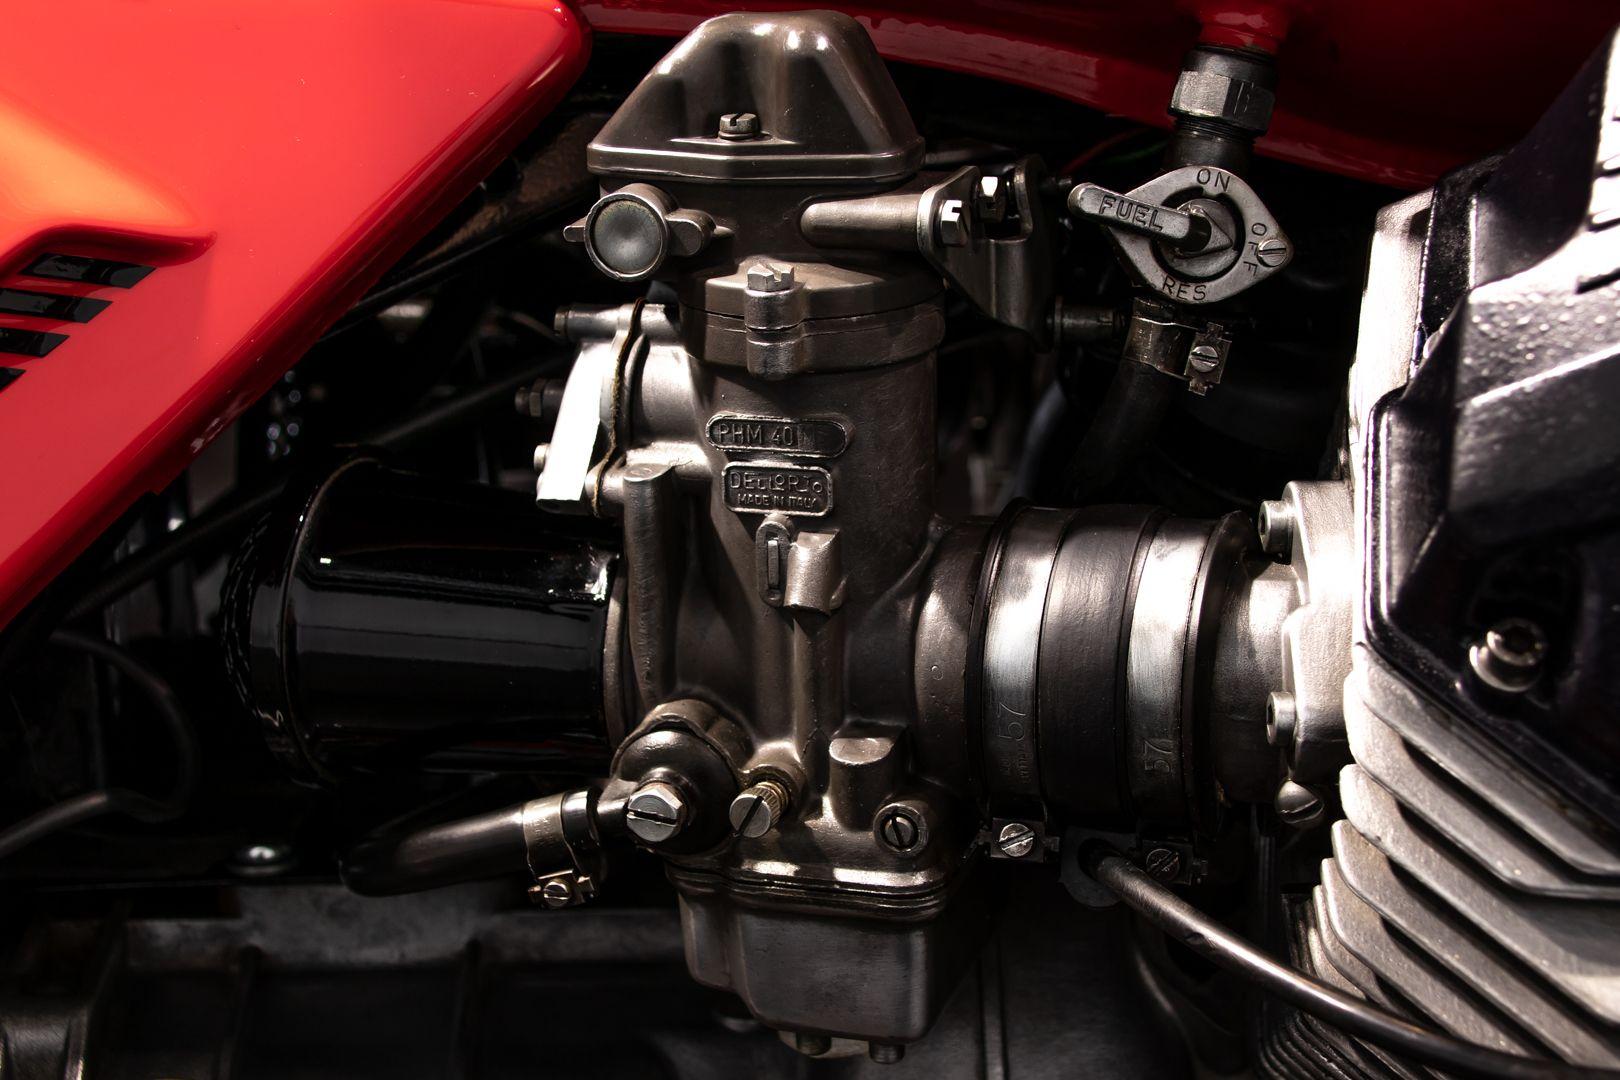 1985 Moto Guzzi le mans 1000 57525